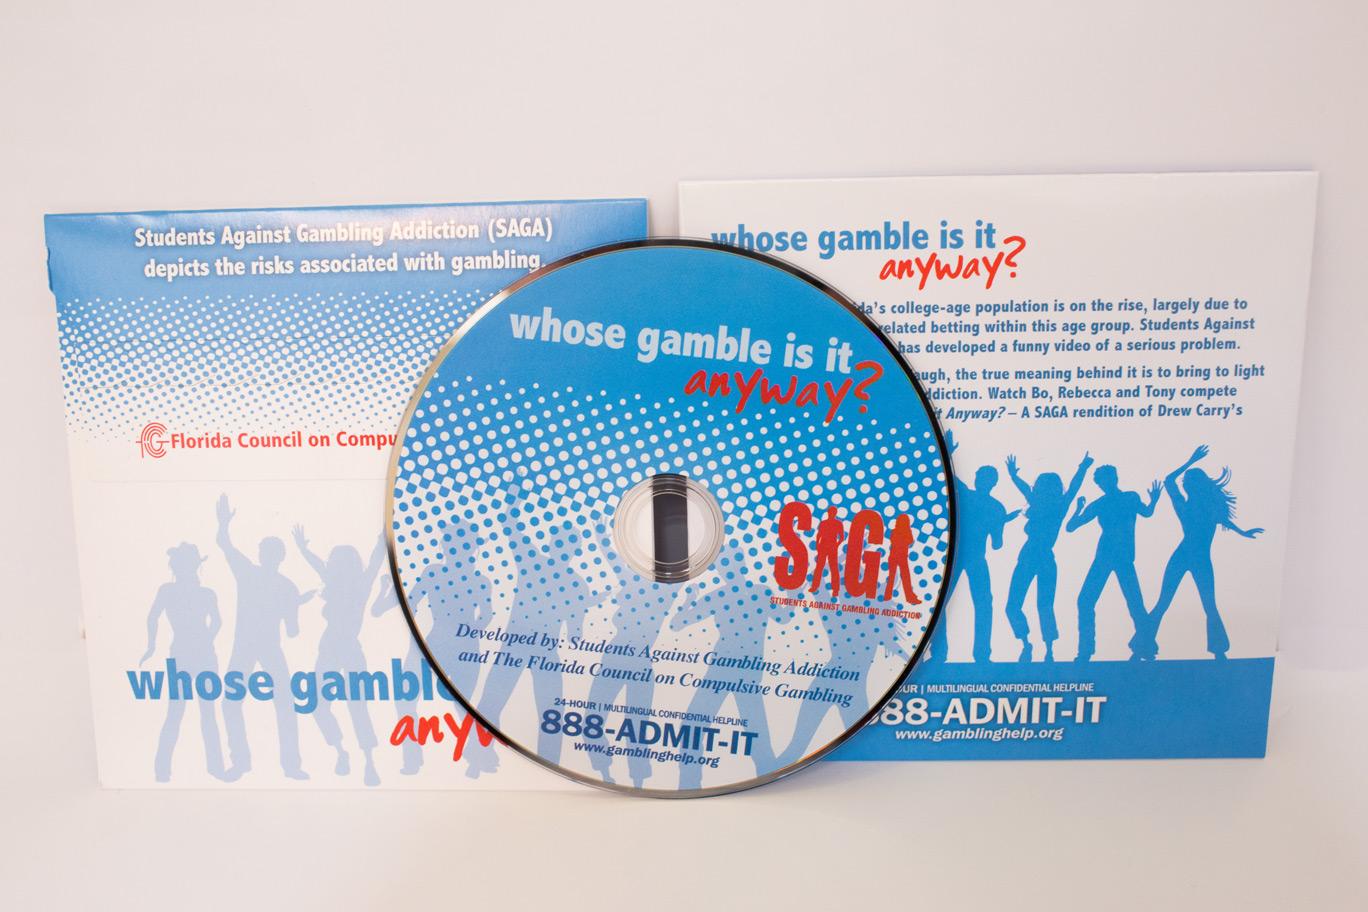 SAGA: Whose Gamble is it Anyway?